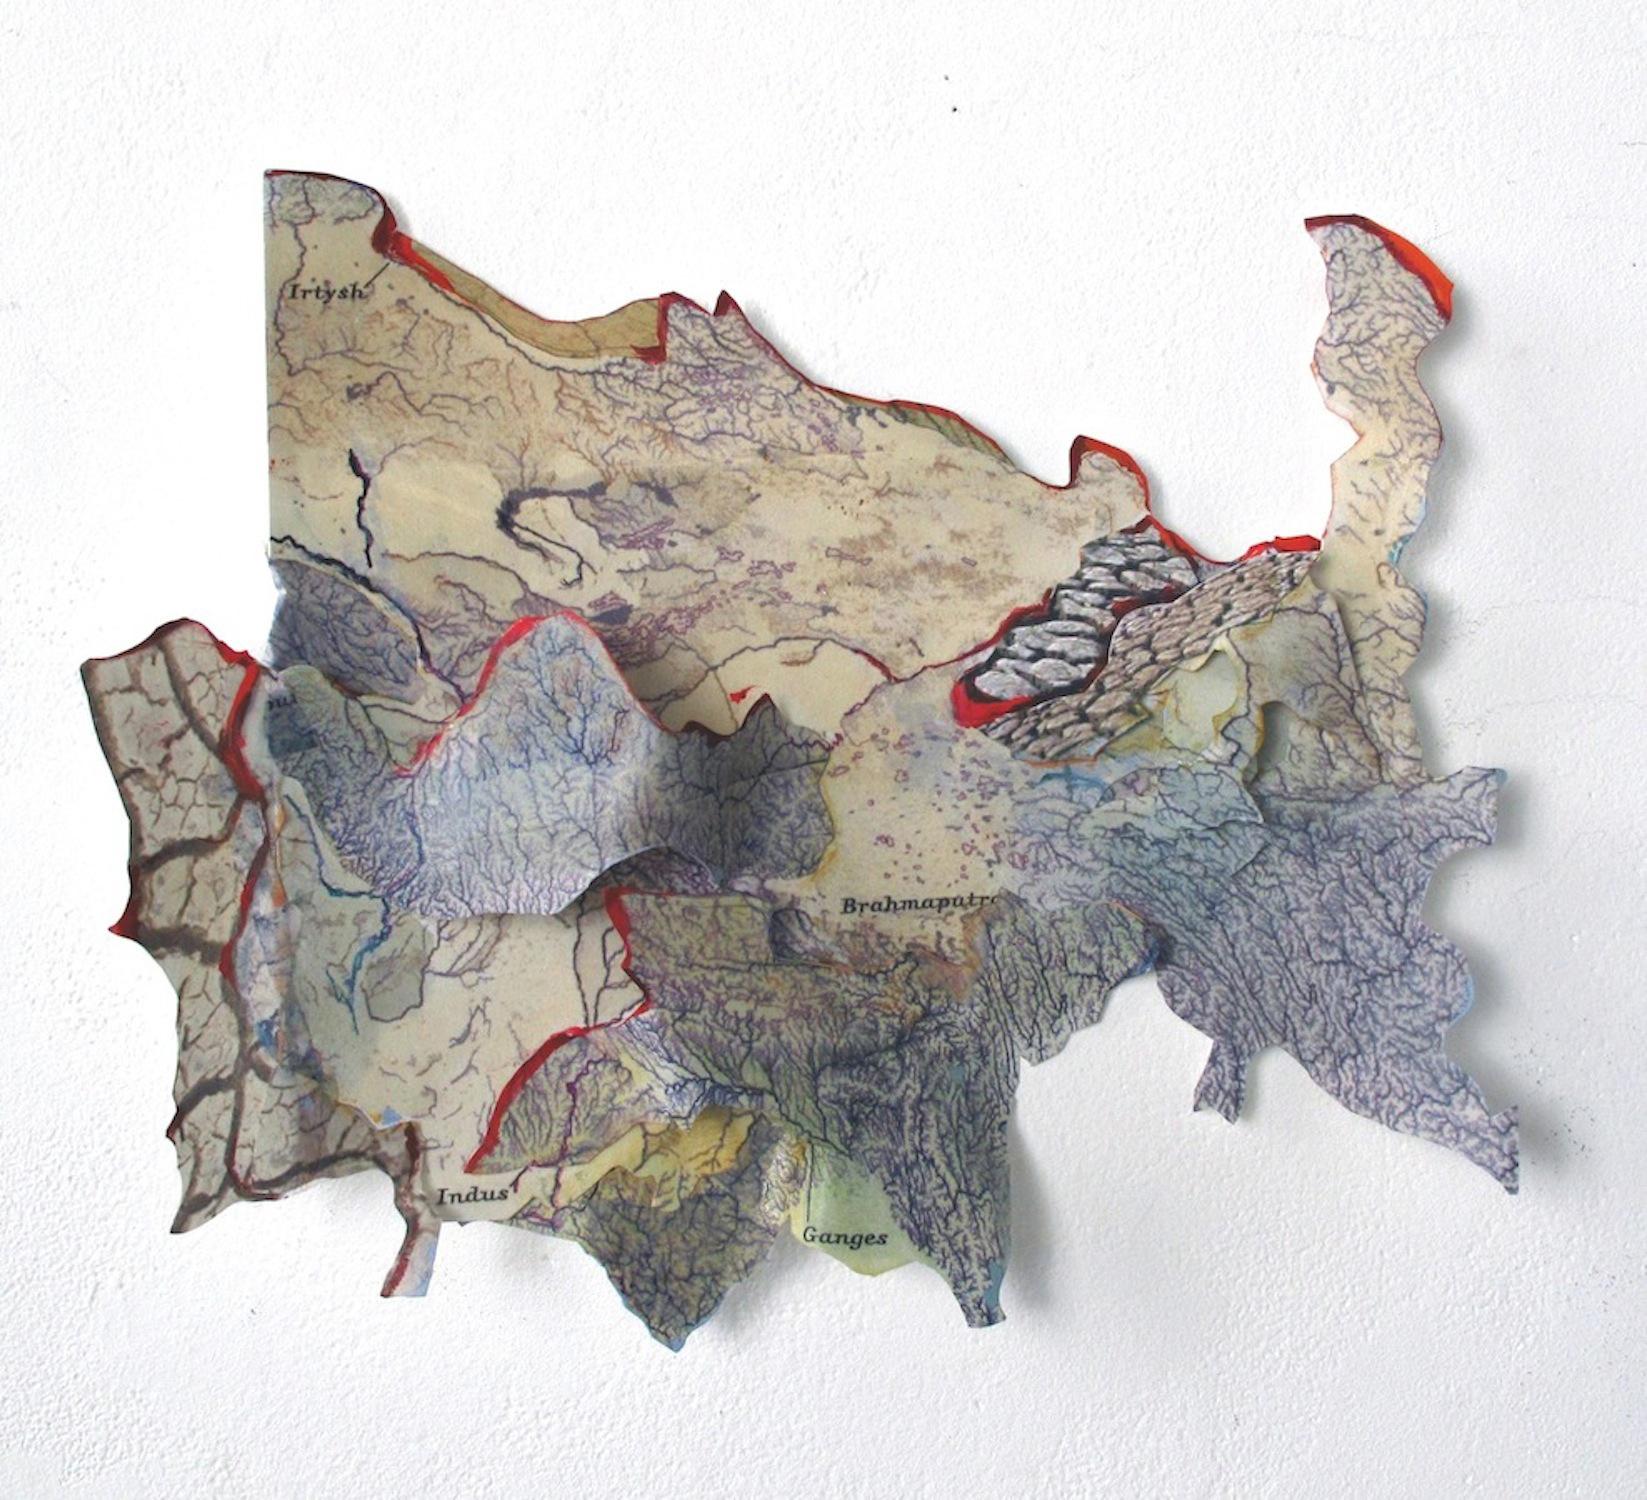 "Torn Asia , 2012, Inkjet print, paint, archival paper, 16"" x 18""x 2.5"""